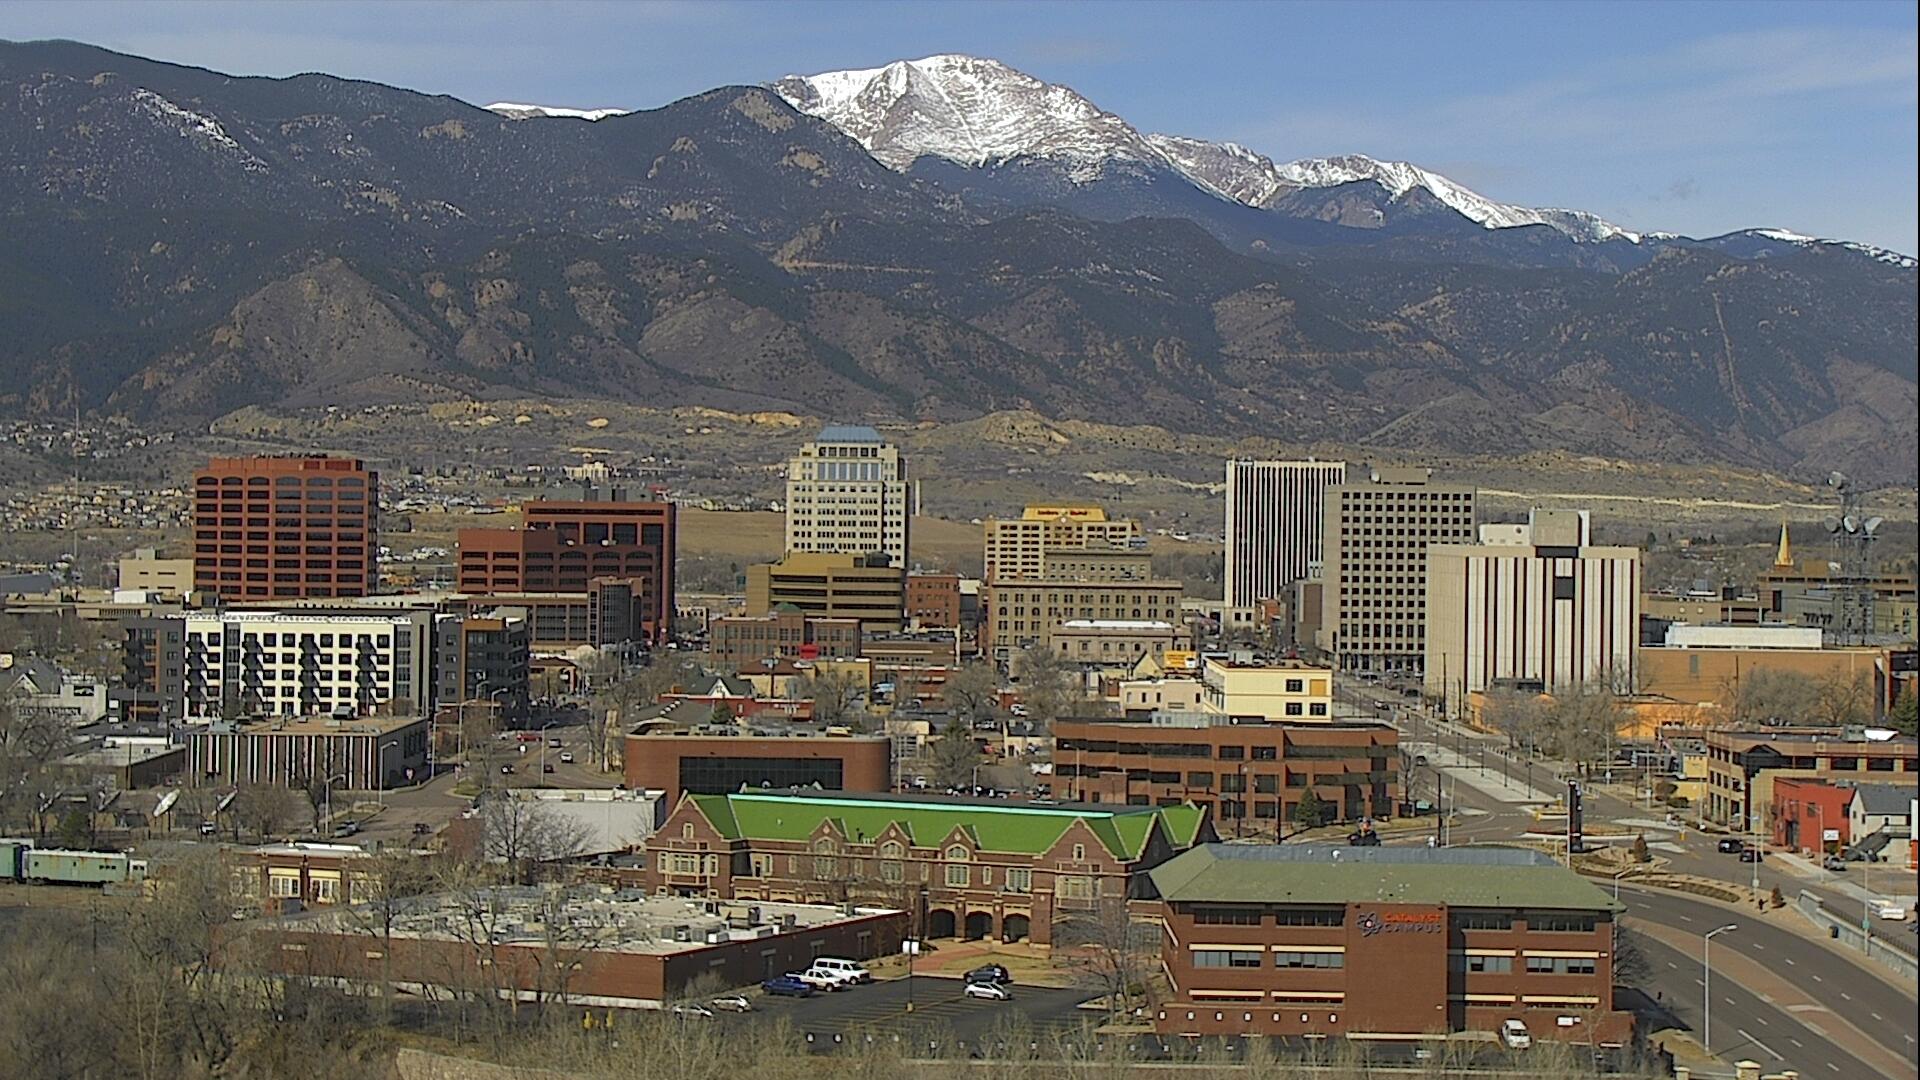 The Colorado Springs skyline around 10:30 a.m. Wednesday.